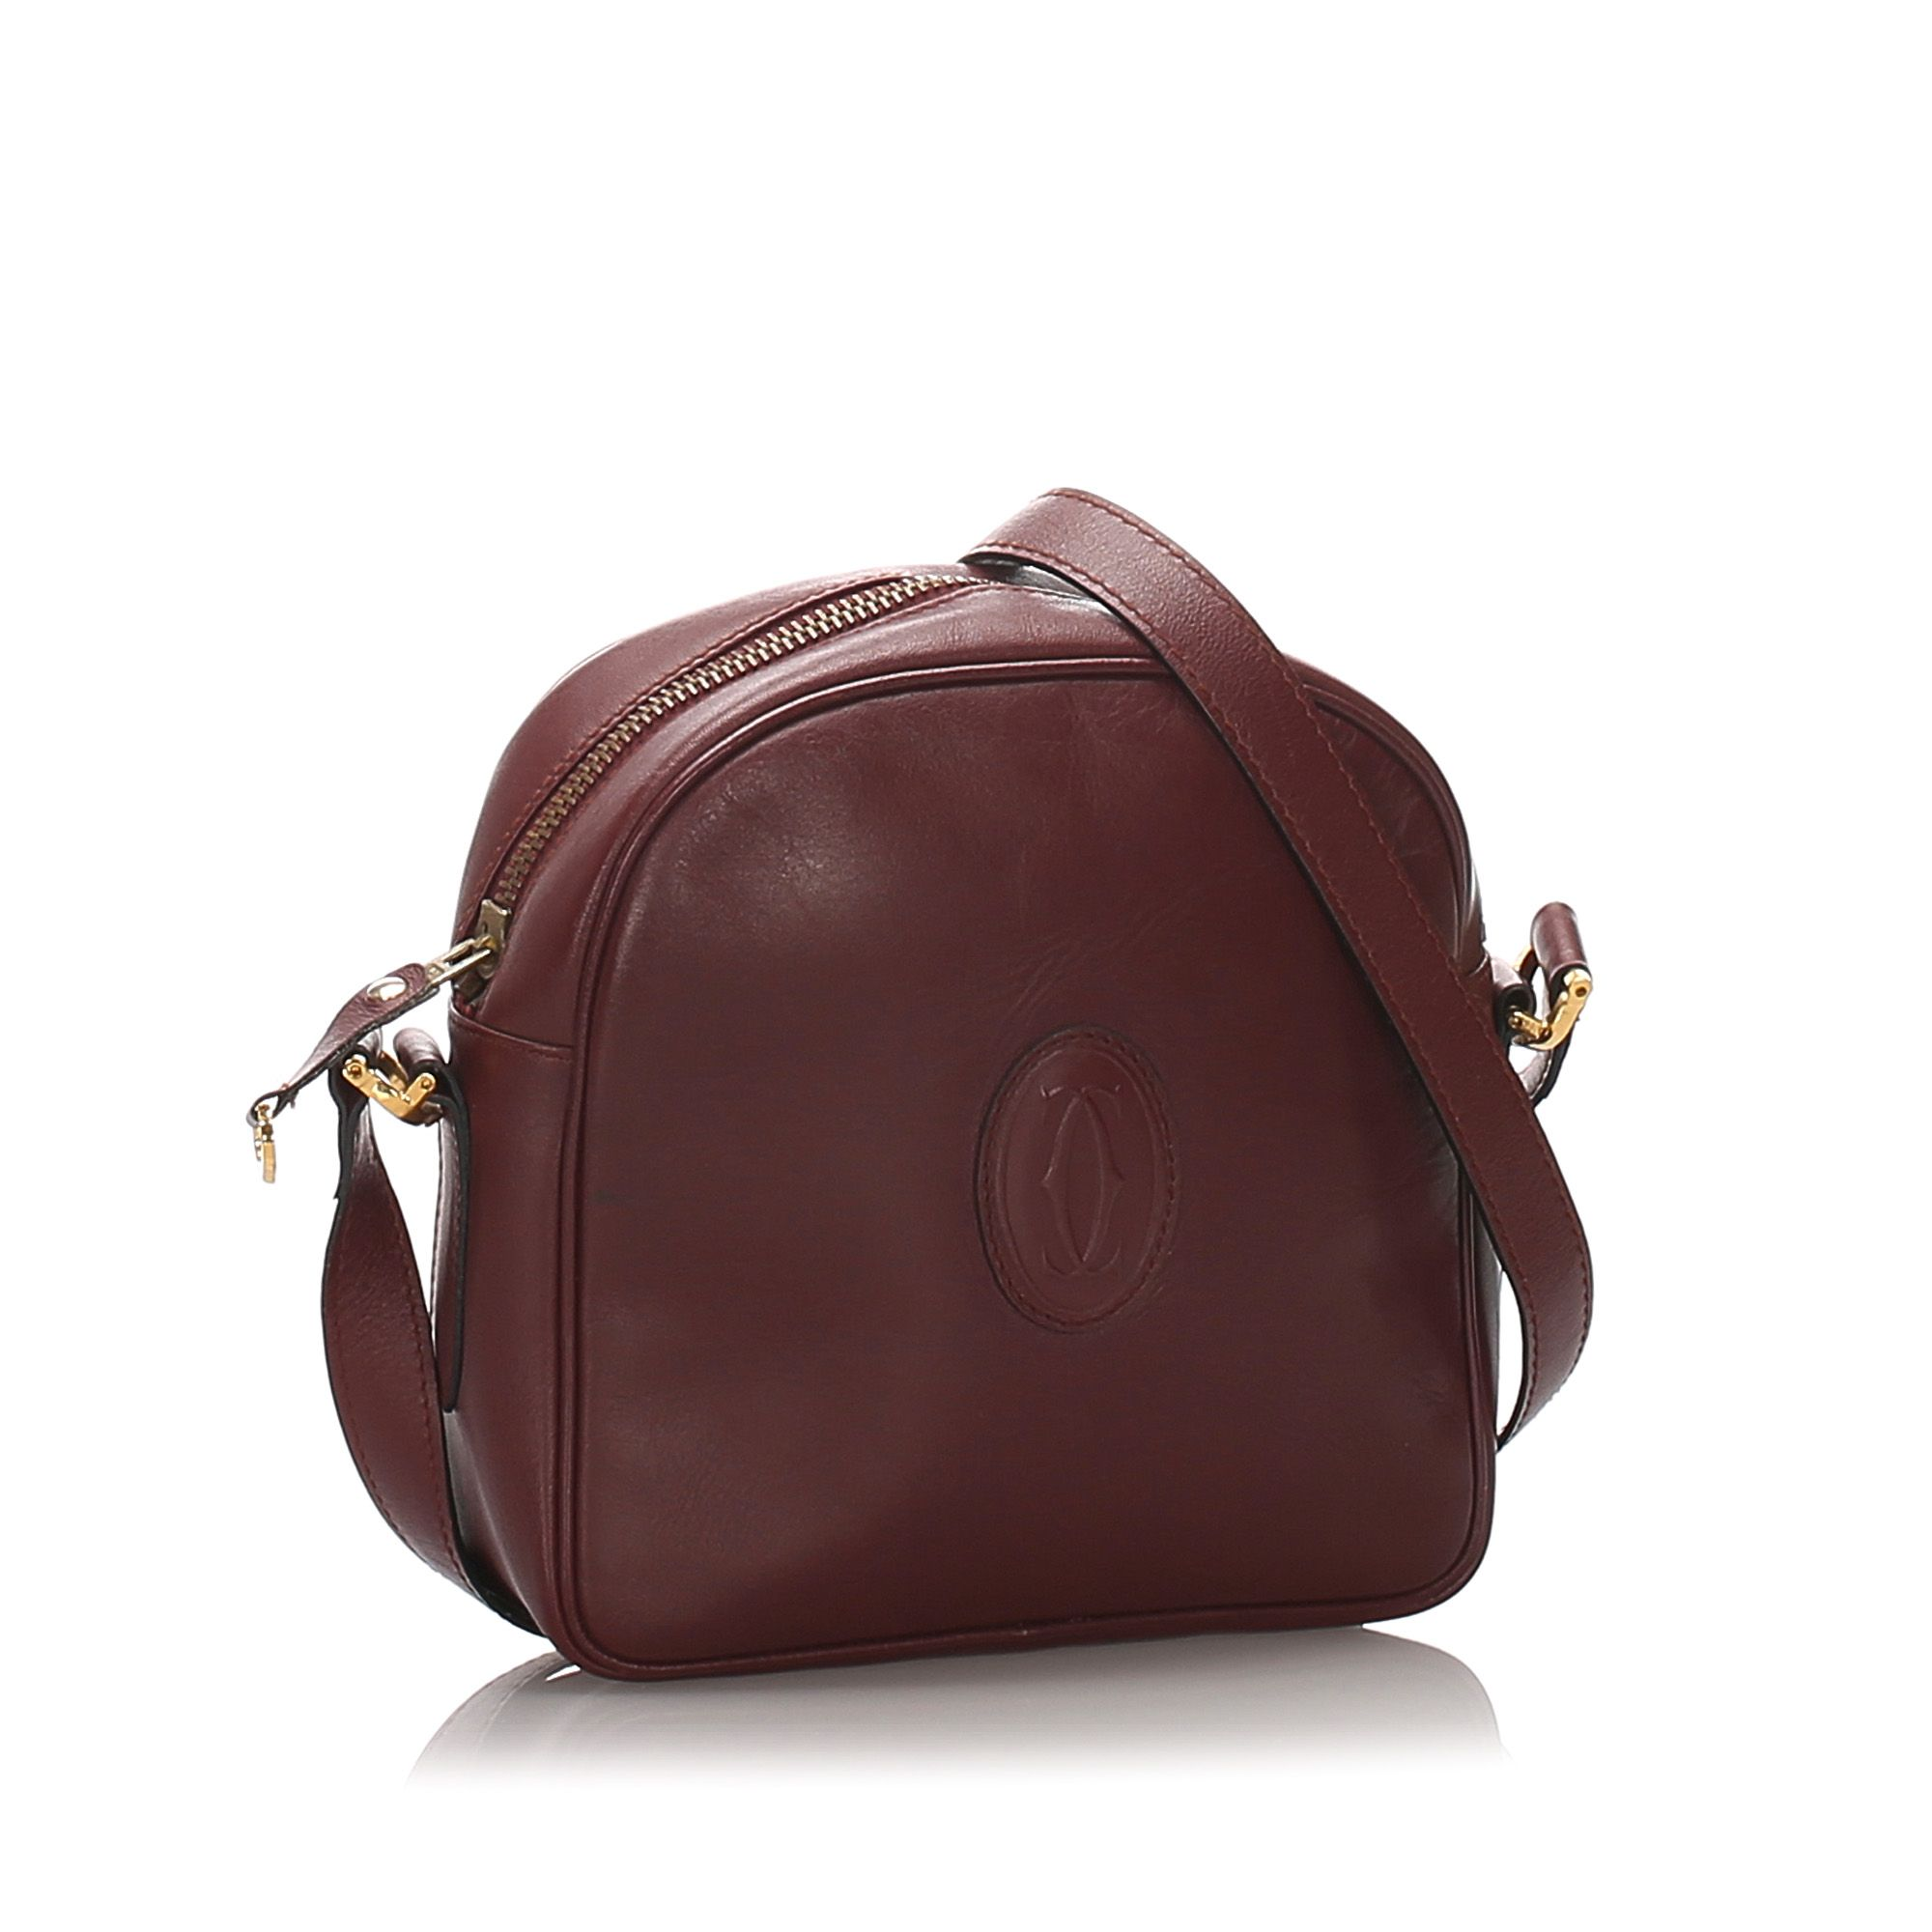 Vintage Cartier Leather Must de Cartier Crossbody Bag Red